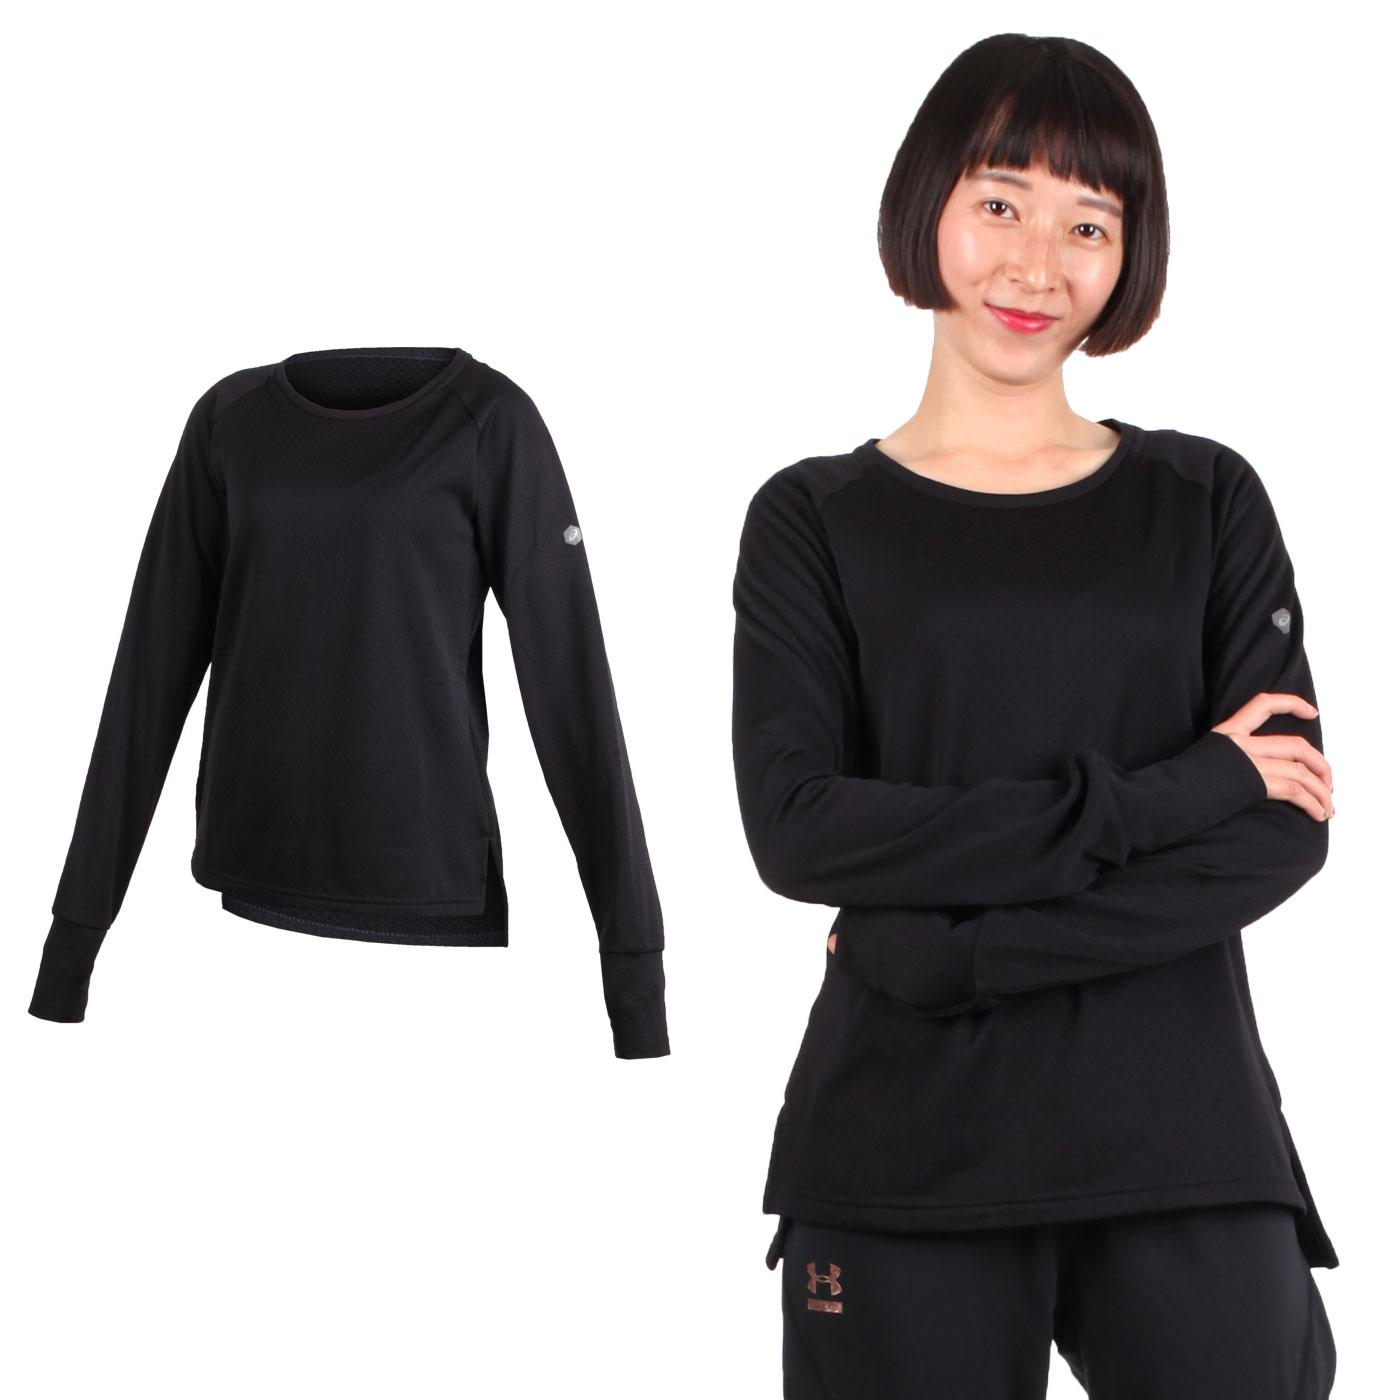 ASICS 女長袖內刷毛保暖T恤 2032A870-002